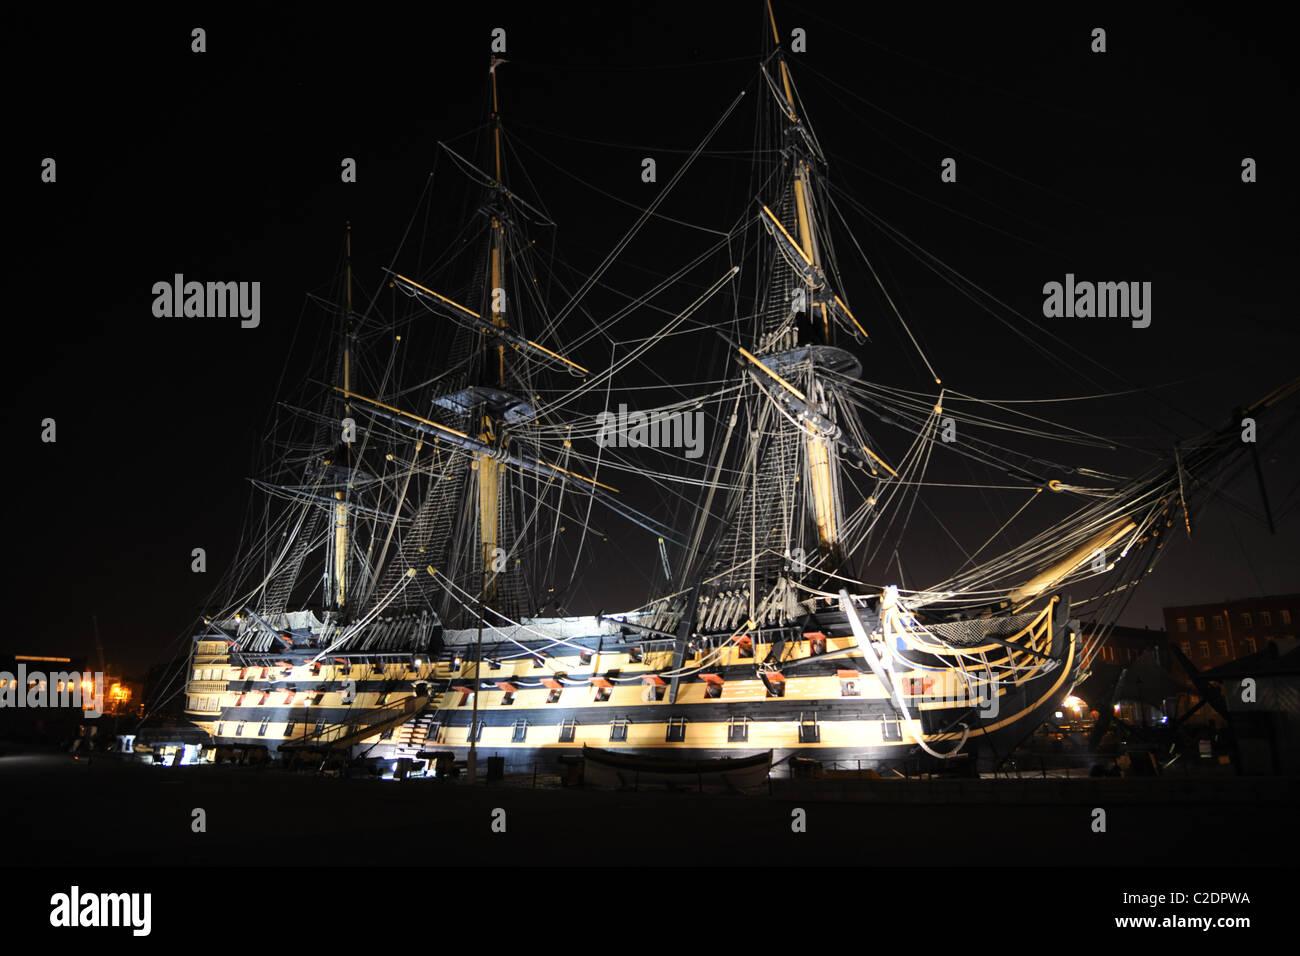 The old warship, man of war sailing ship HMS Victory, floodlit at night. - Stock Image